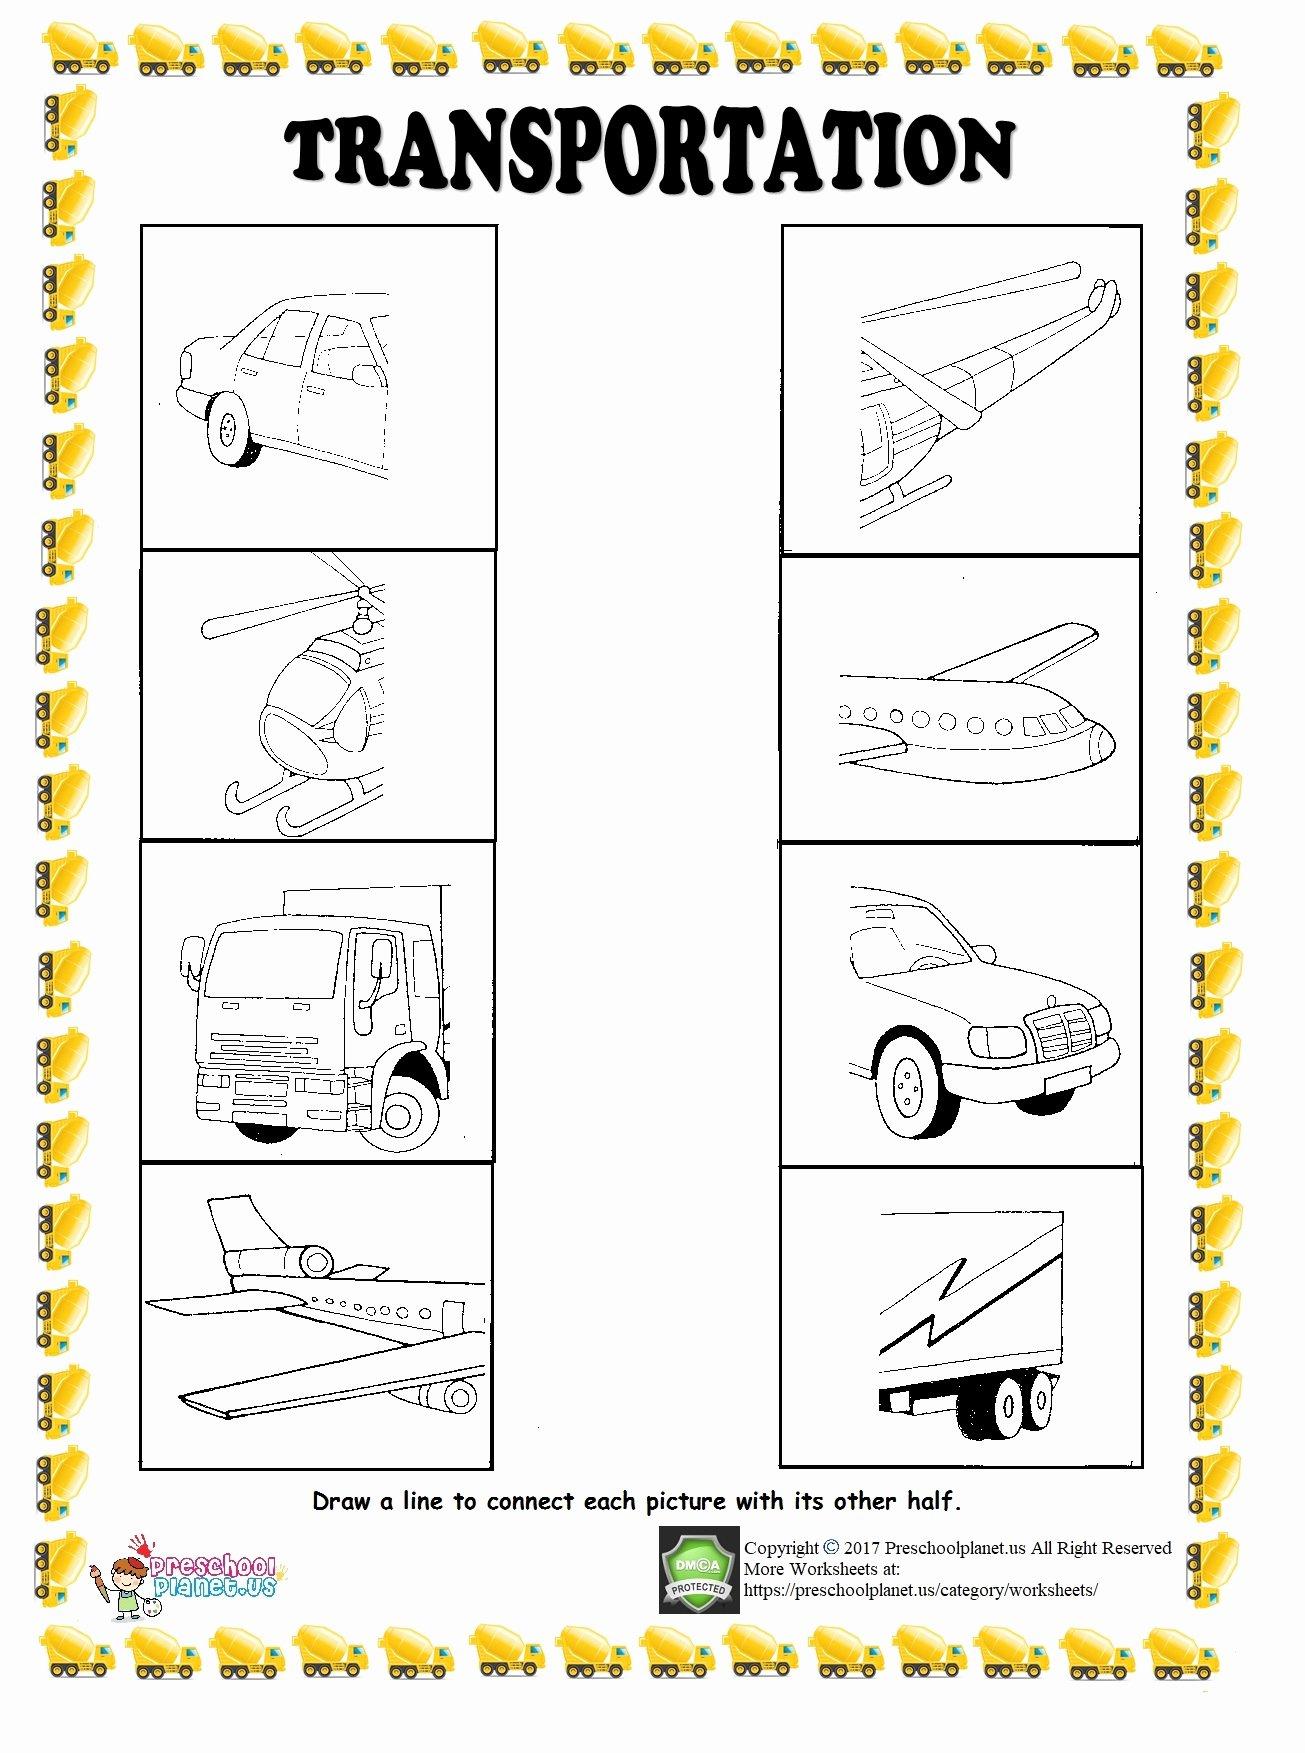 Vehicles Worksheets for Preschoolers Inspirational Find Half Of Given Transportation Worksheet – Preschoolplanet